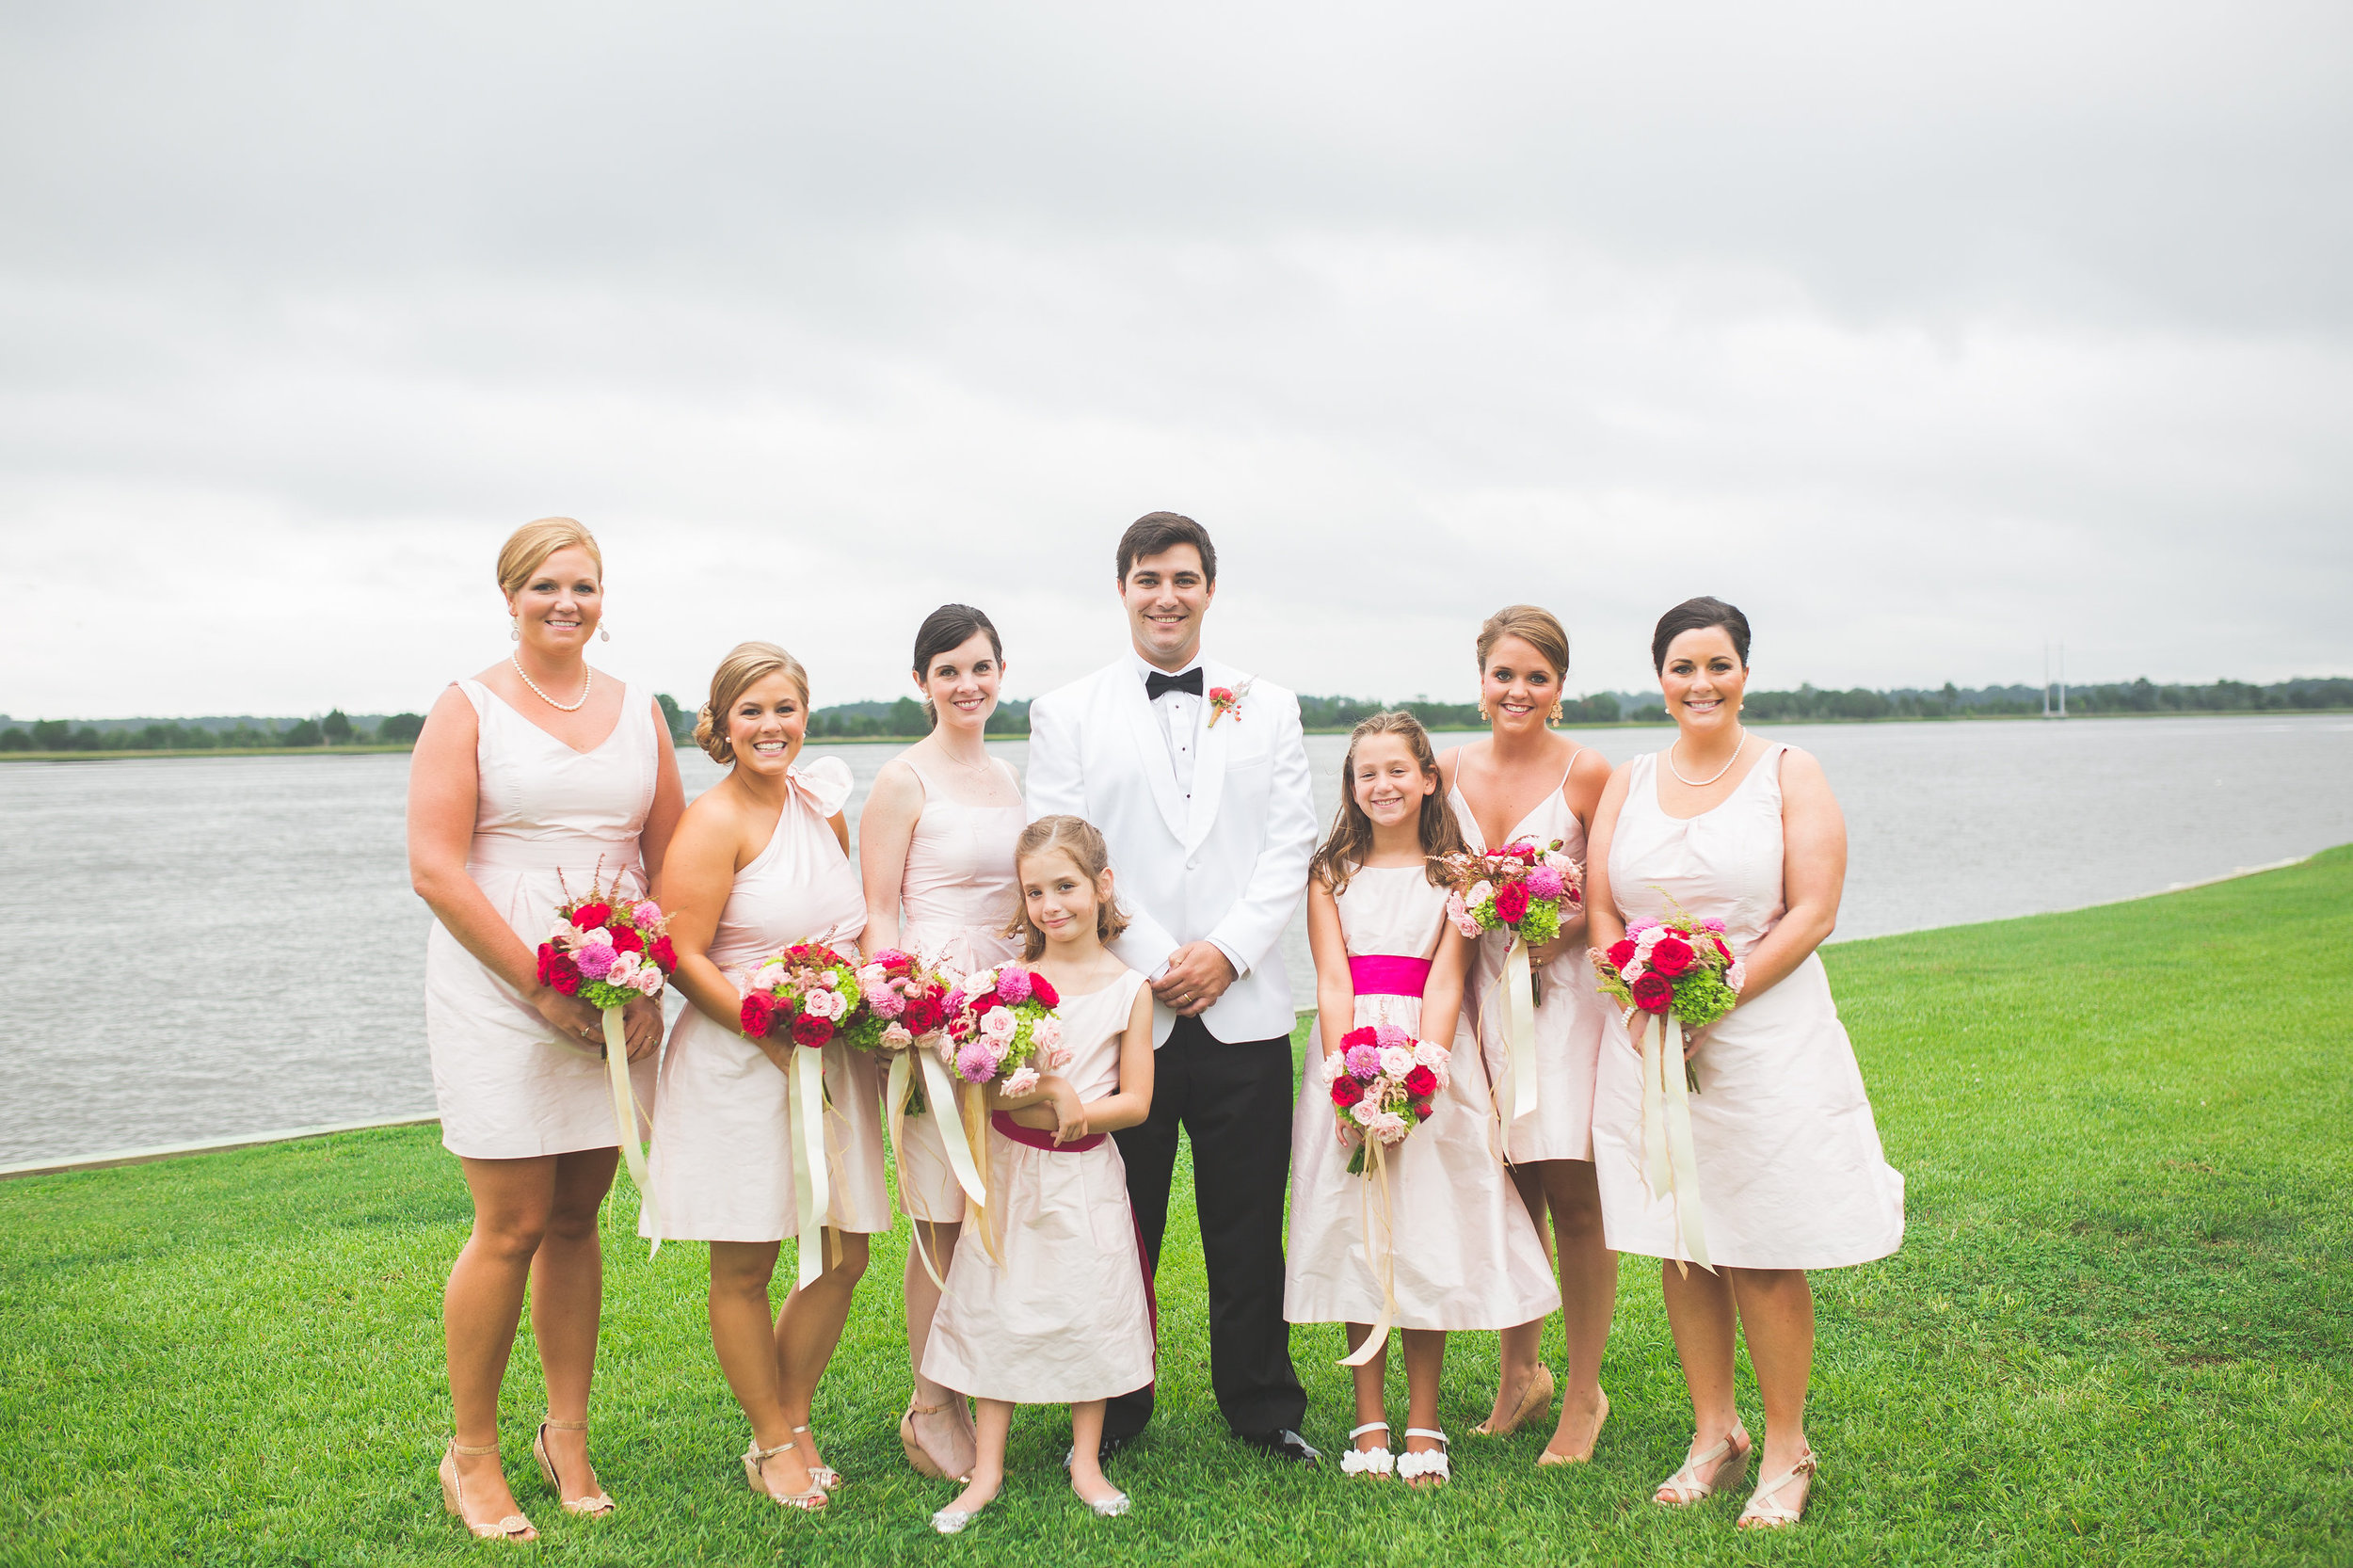 LulaKate bridesmaids dresses